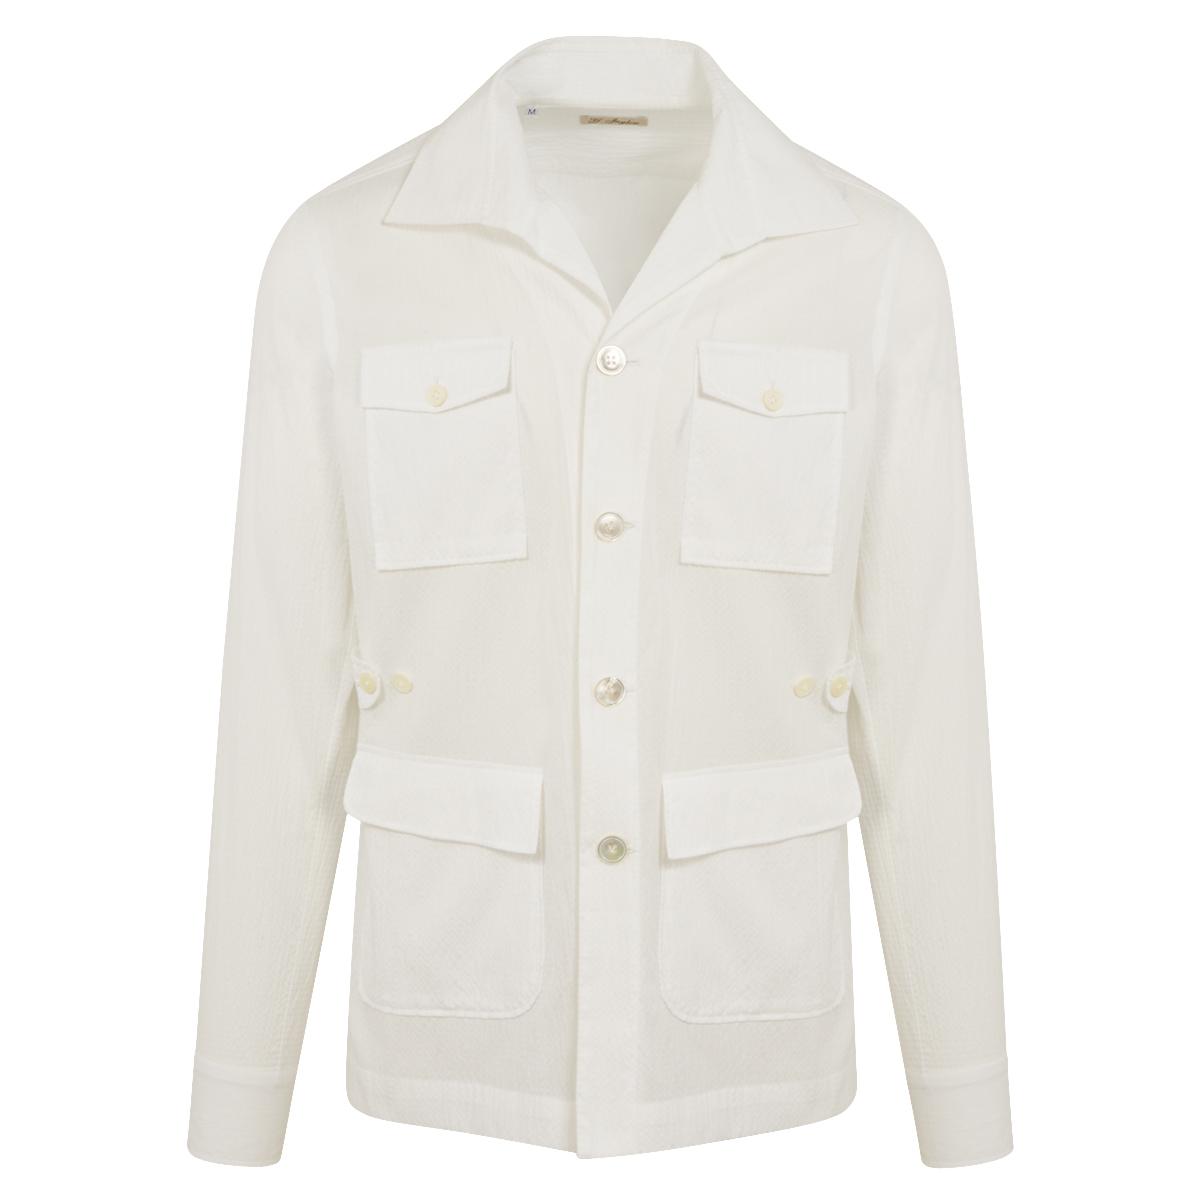 White Seersucker Cotton Safari Over-Shirt